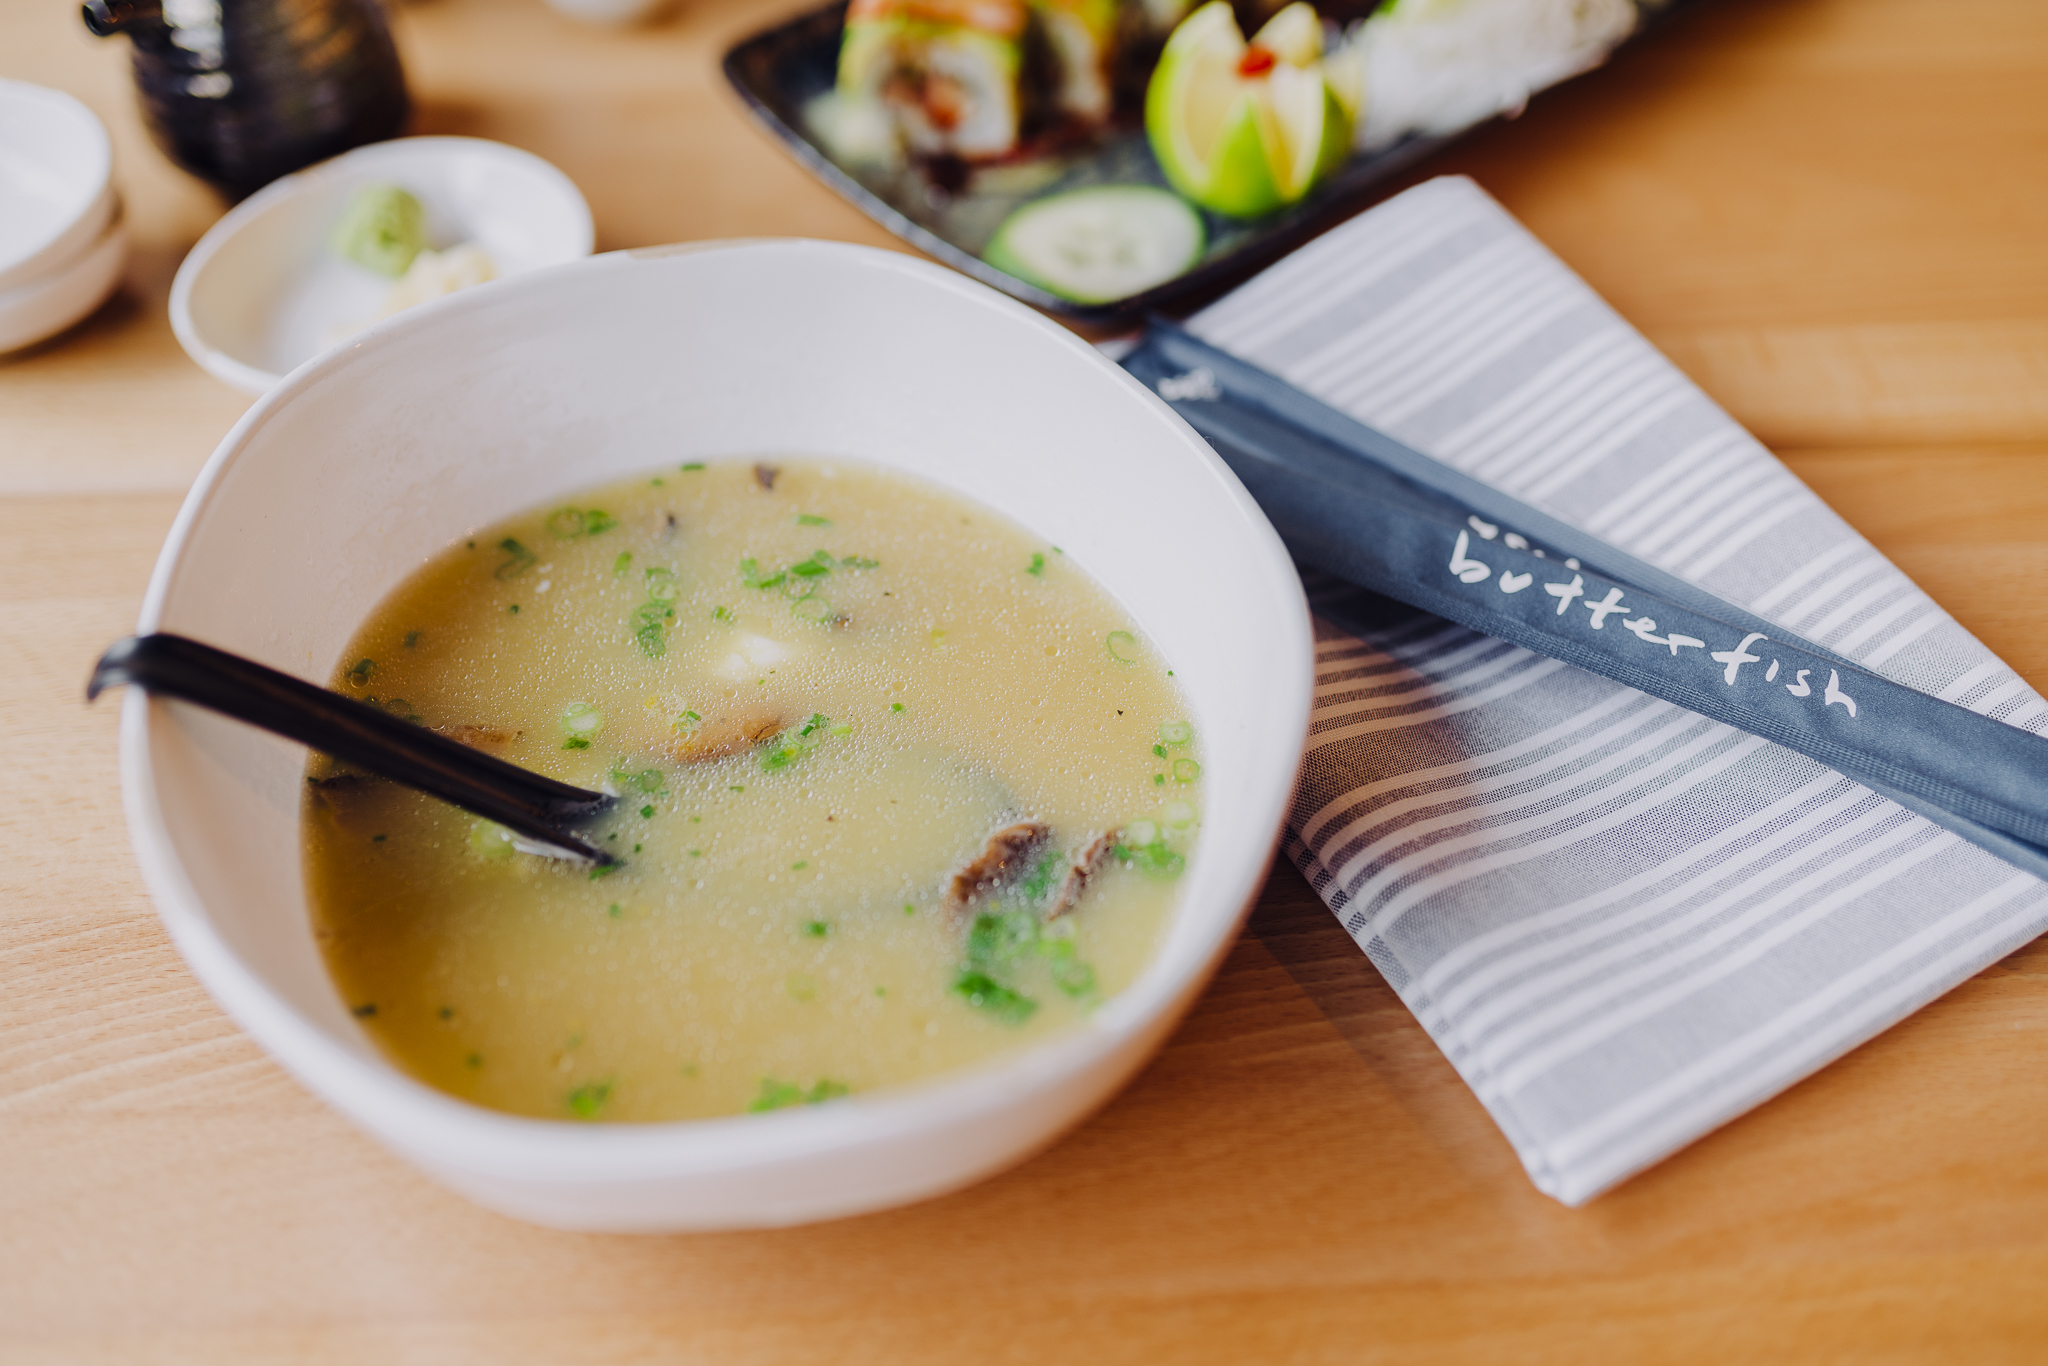 Egg Drop Soup - chicken consomme, enoki mushroom, scallion, chicken fat, shoyu, soft egg